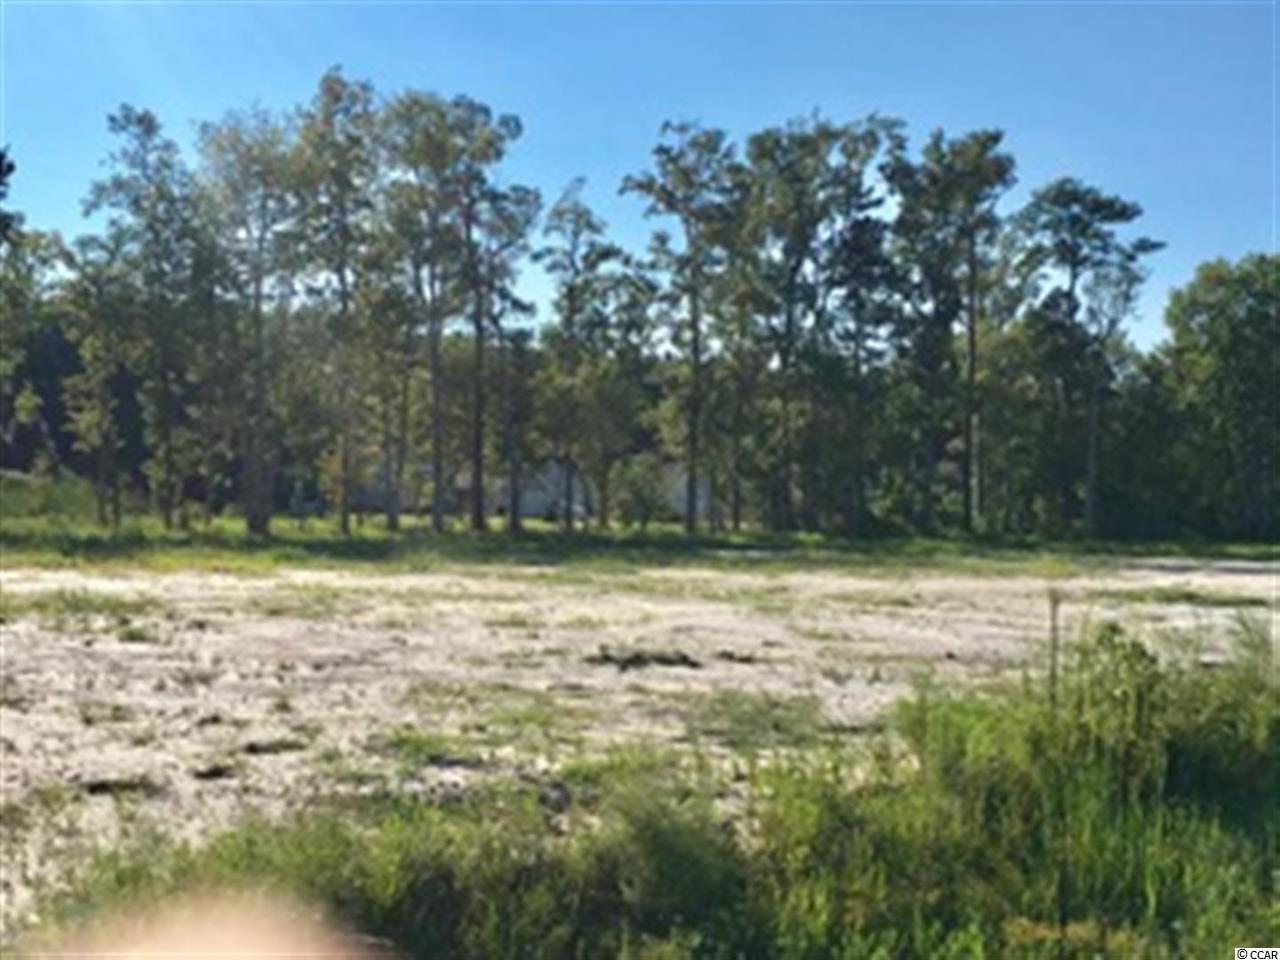 Lot 31-B2 Cypress Dr. - Photo 1